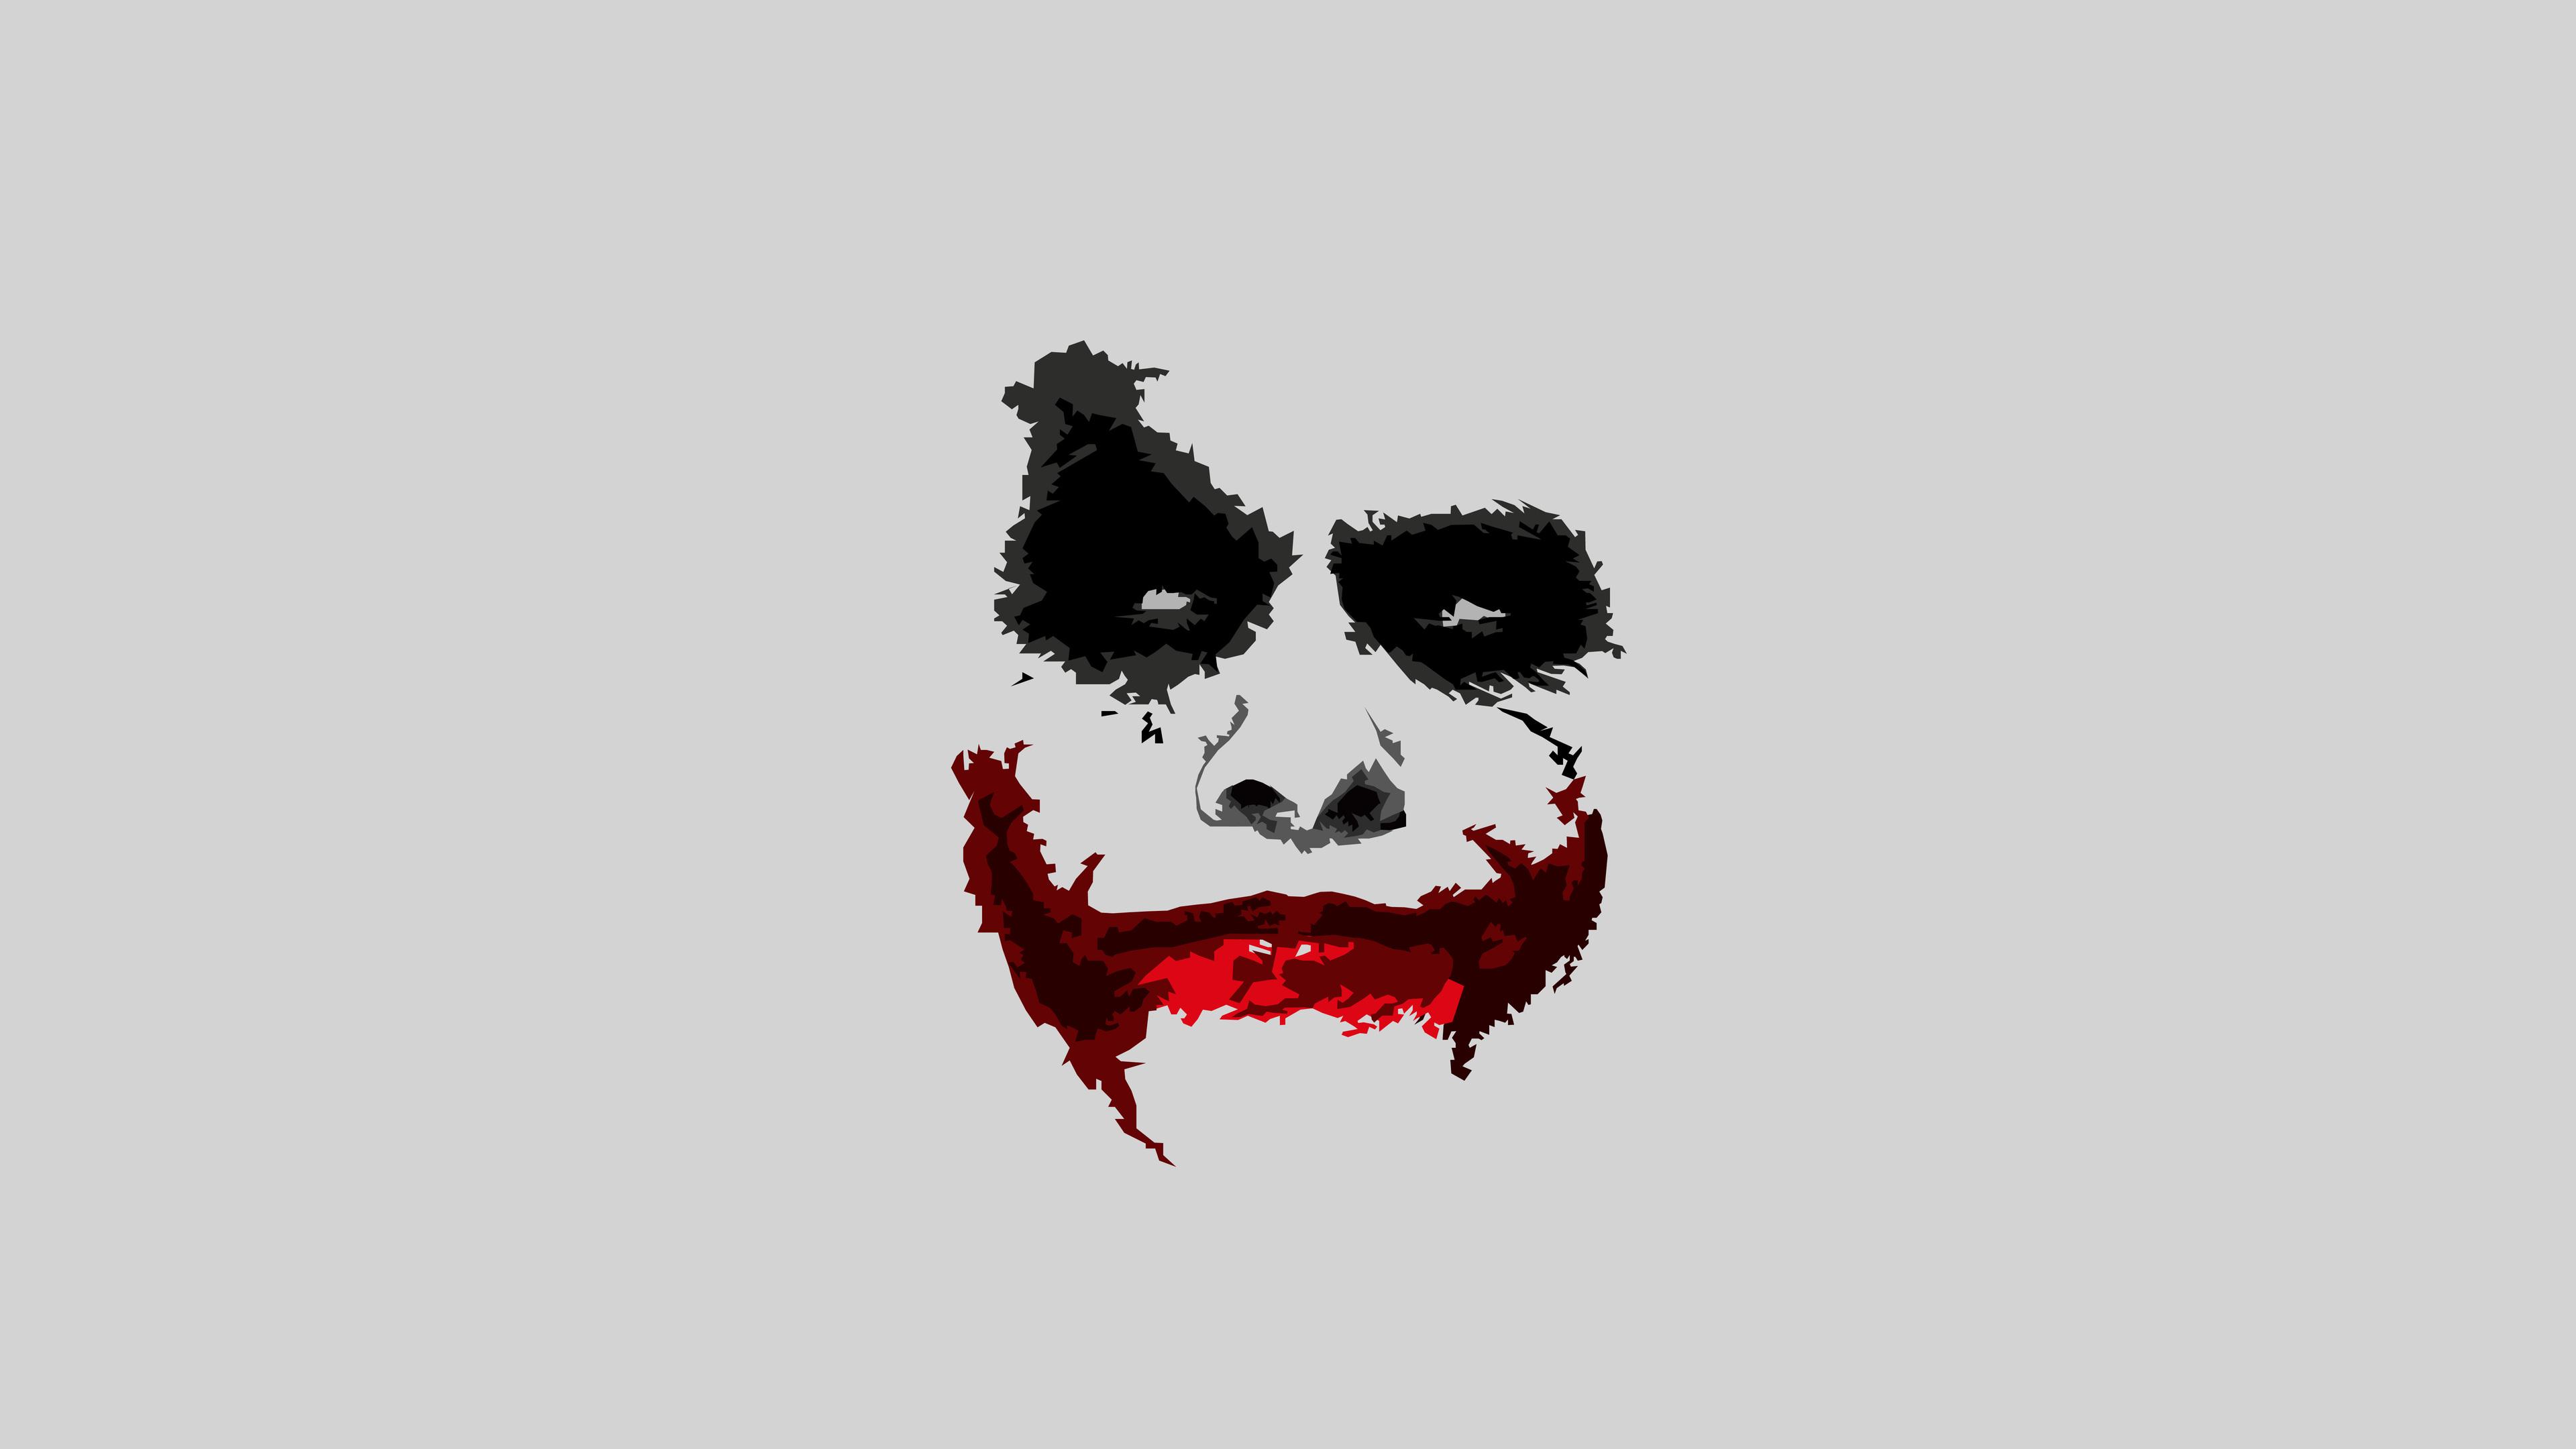 joker 8k minimalism 1536522610 - Joker 8k Minimalism - minimalism wallpapers, joker wallpapers, hd-wallpapers, digital art wallpapers, deviantart wallpapers, artwork wallpapers, artist wallpapers, 8k wallpapers, 5k wallpapers, 4k-wallpapers